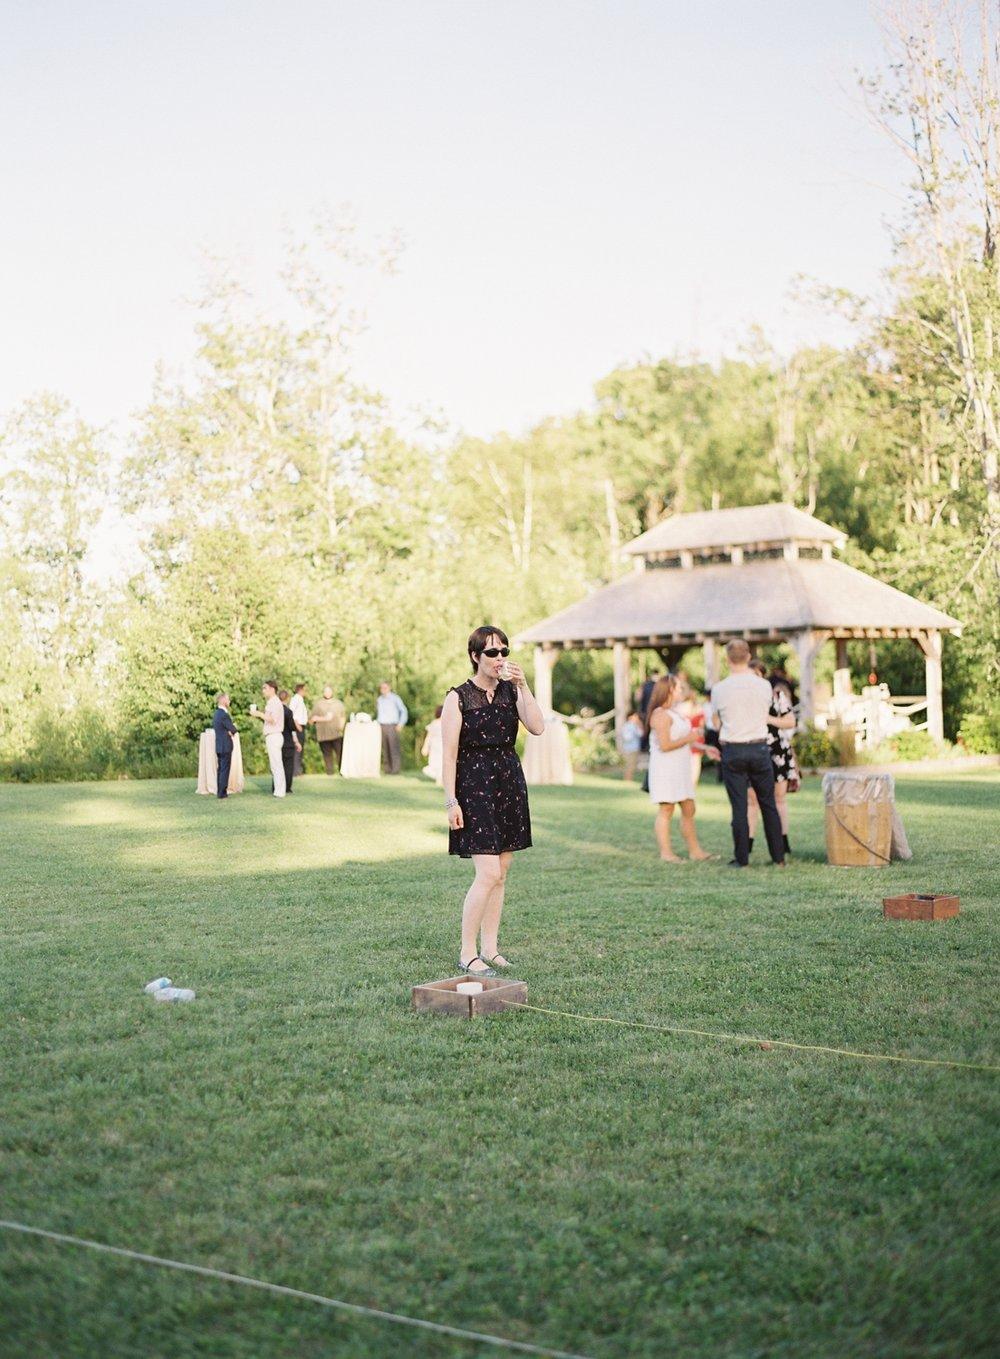 Jacqueline Anne Photography - Nova Scotia Backyard Wedding-57.jpg